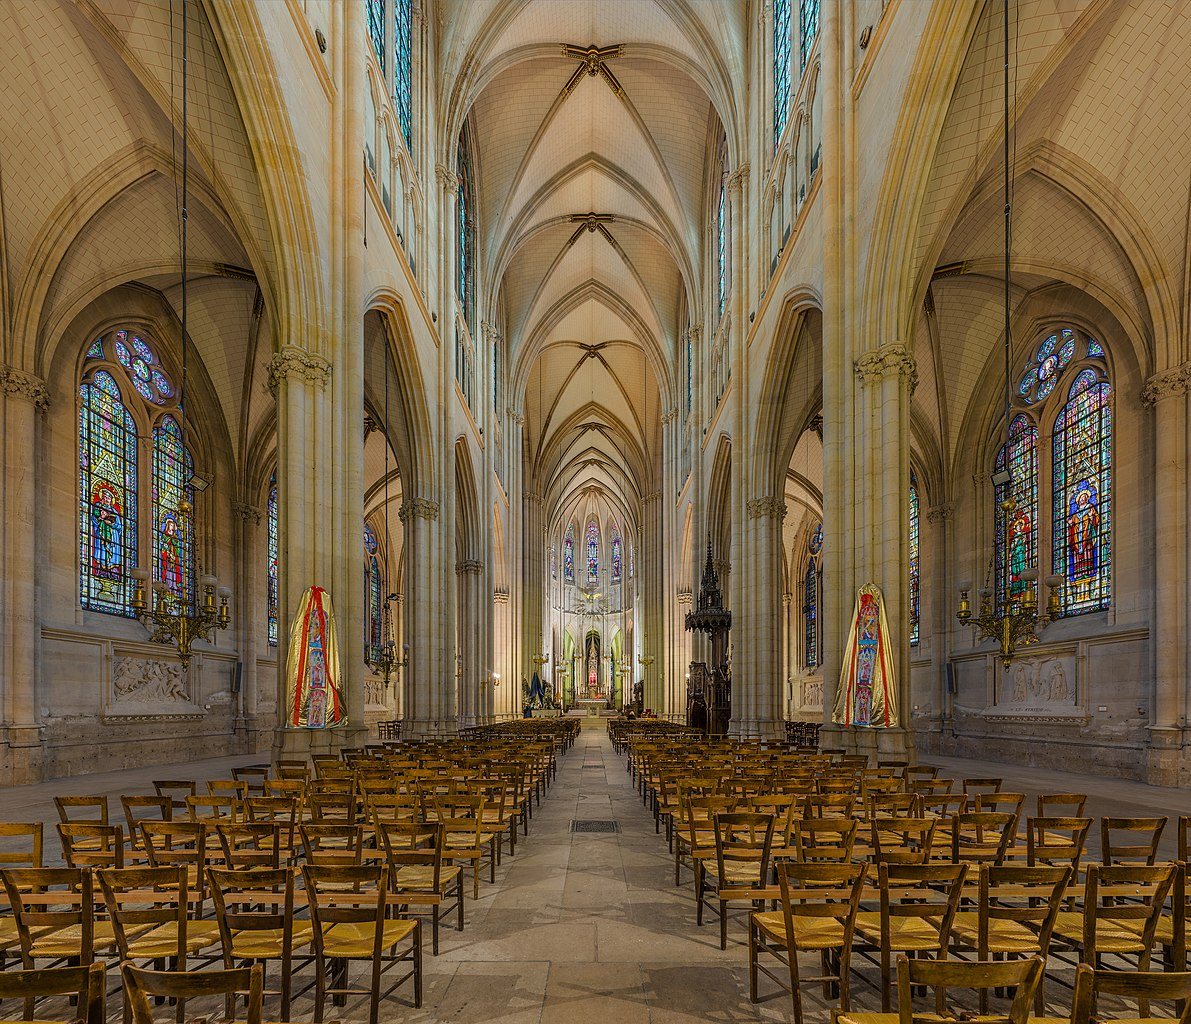 File:Basilica of Saint Clotilde Interior, Paris, France